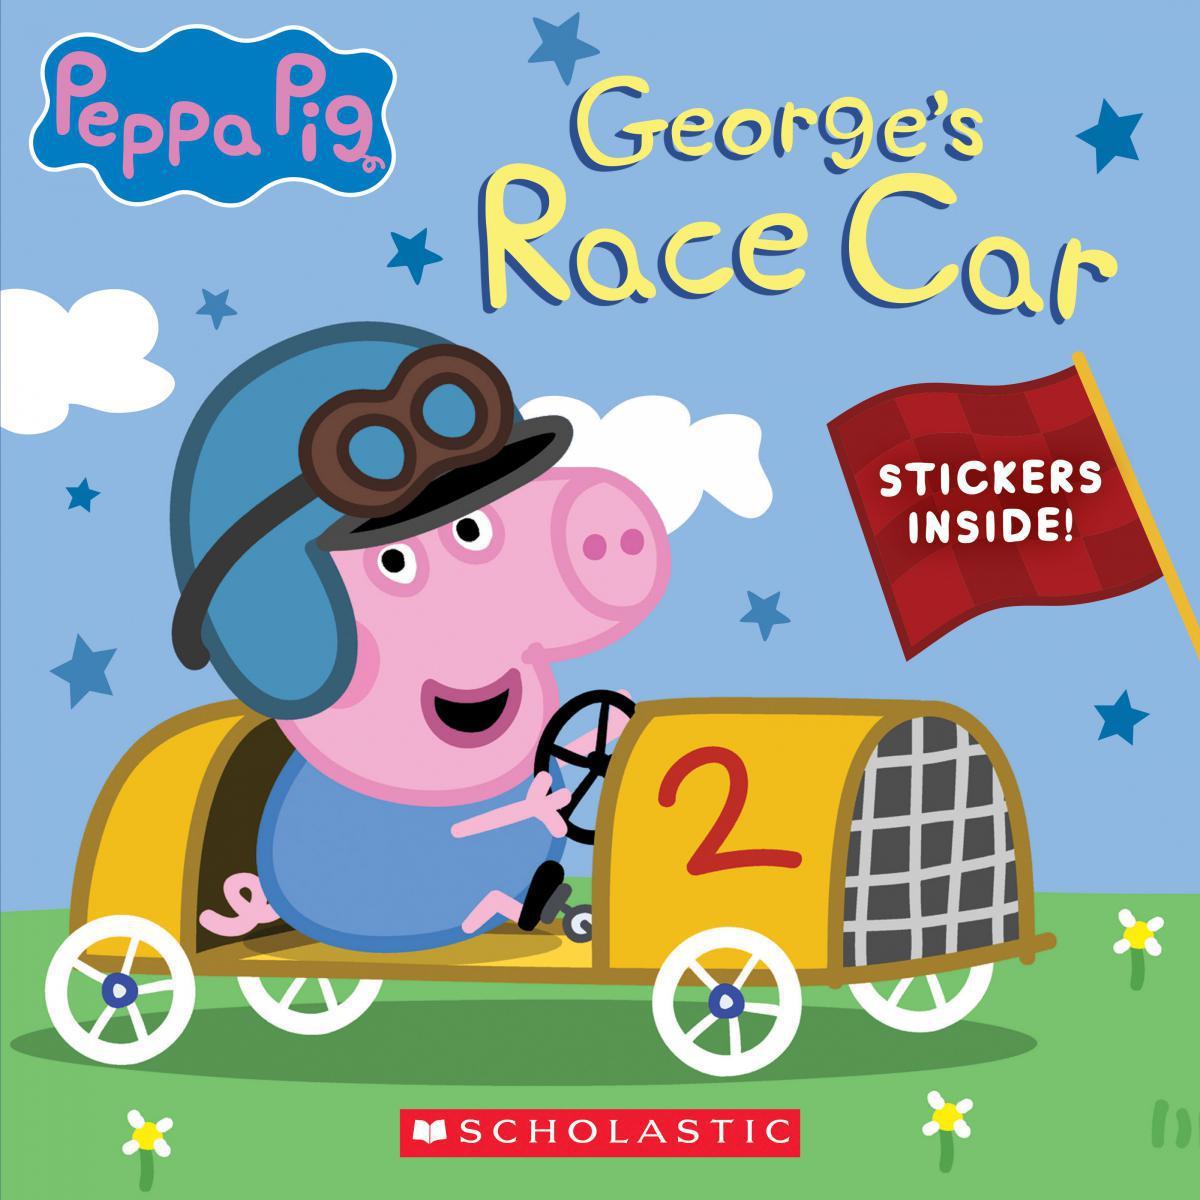 Peppa Pig: George's Race Car